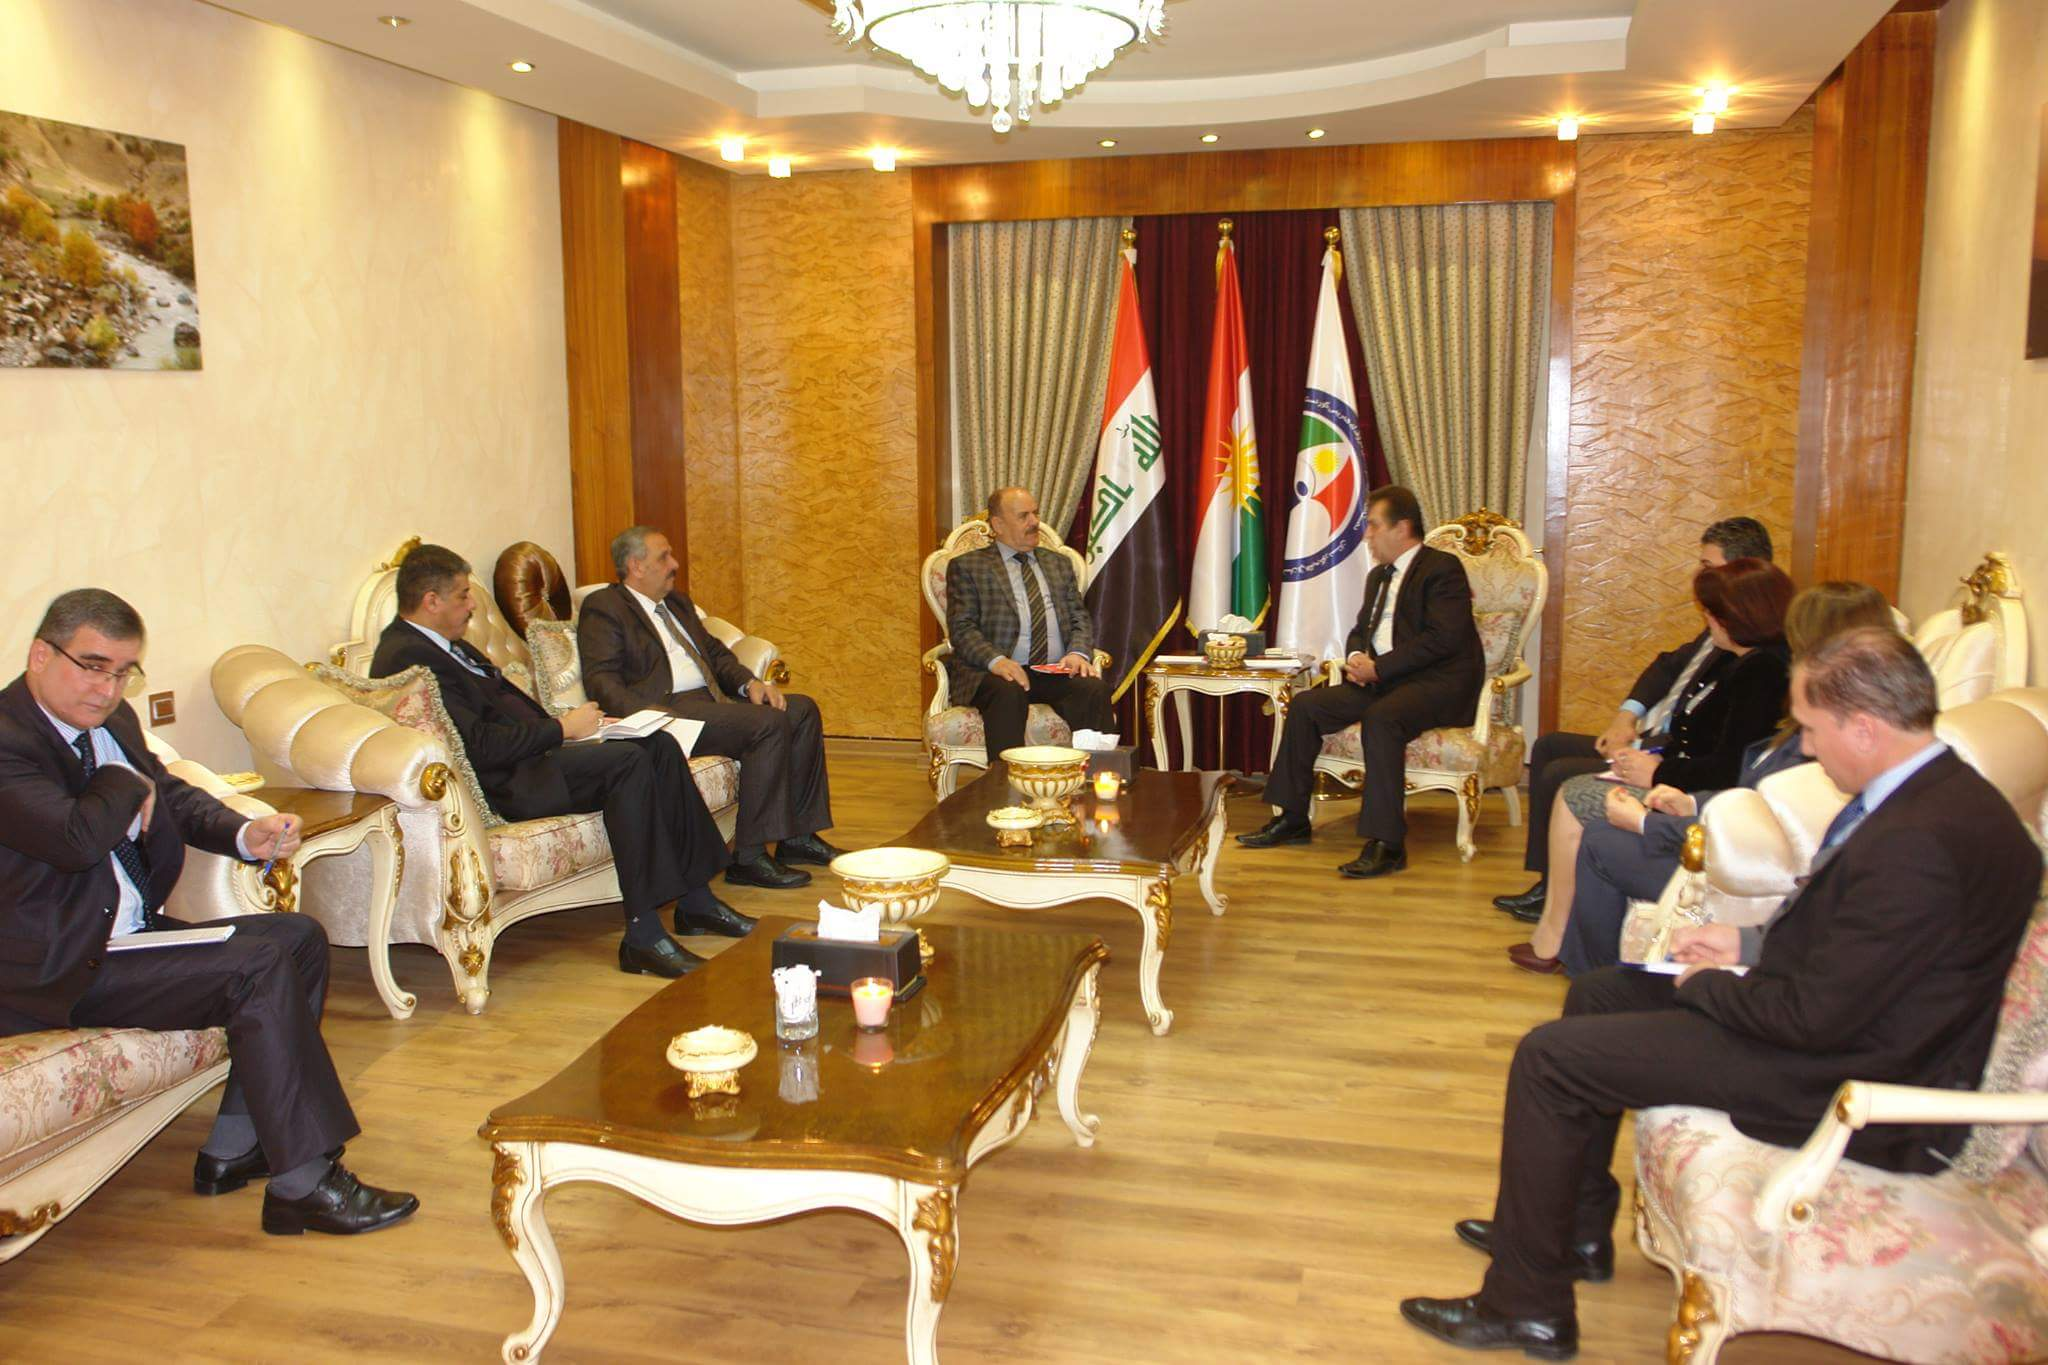 <a class=&quot;amazingslider-posttitle-link&quot; href=&quot;http://ihrckr.org/en/kurdistan-human-right-commission-al-hayat-university-erbil-agree-framing-memorandum-understanding-draft/&quot;>Kurdistan Human Right Commission and Al hayat University at Erbil agree on framing Memorandum of Understanding draft</a>